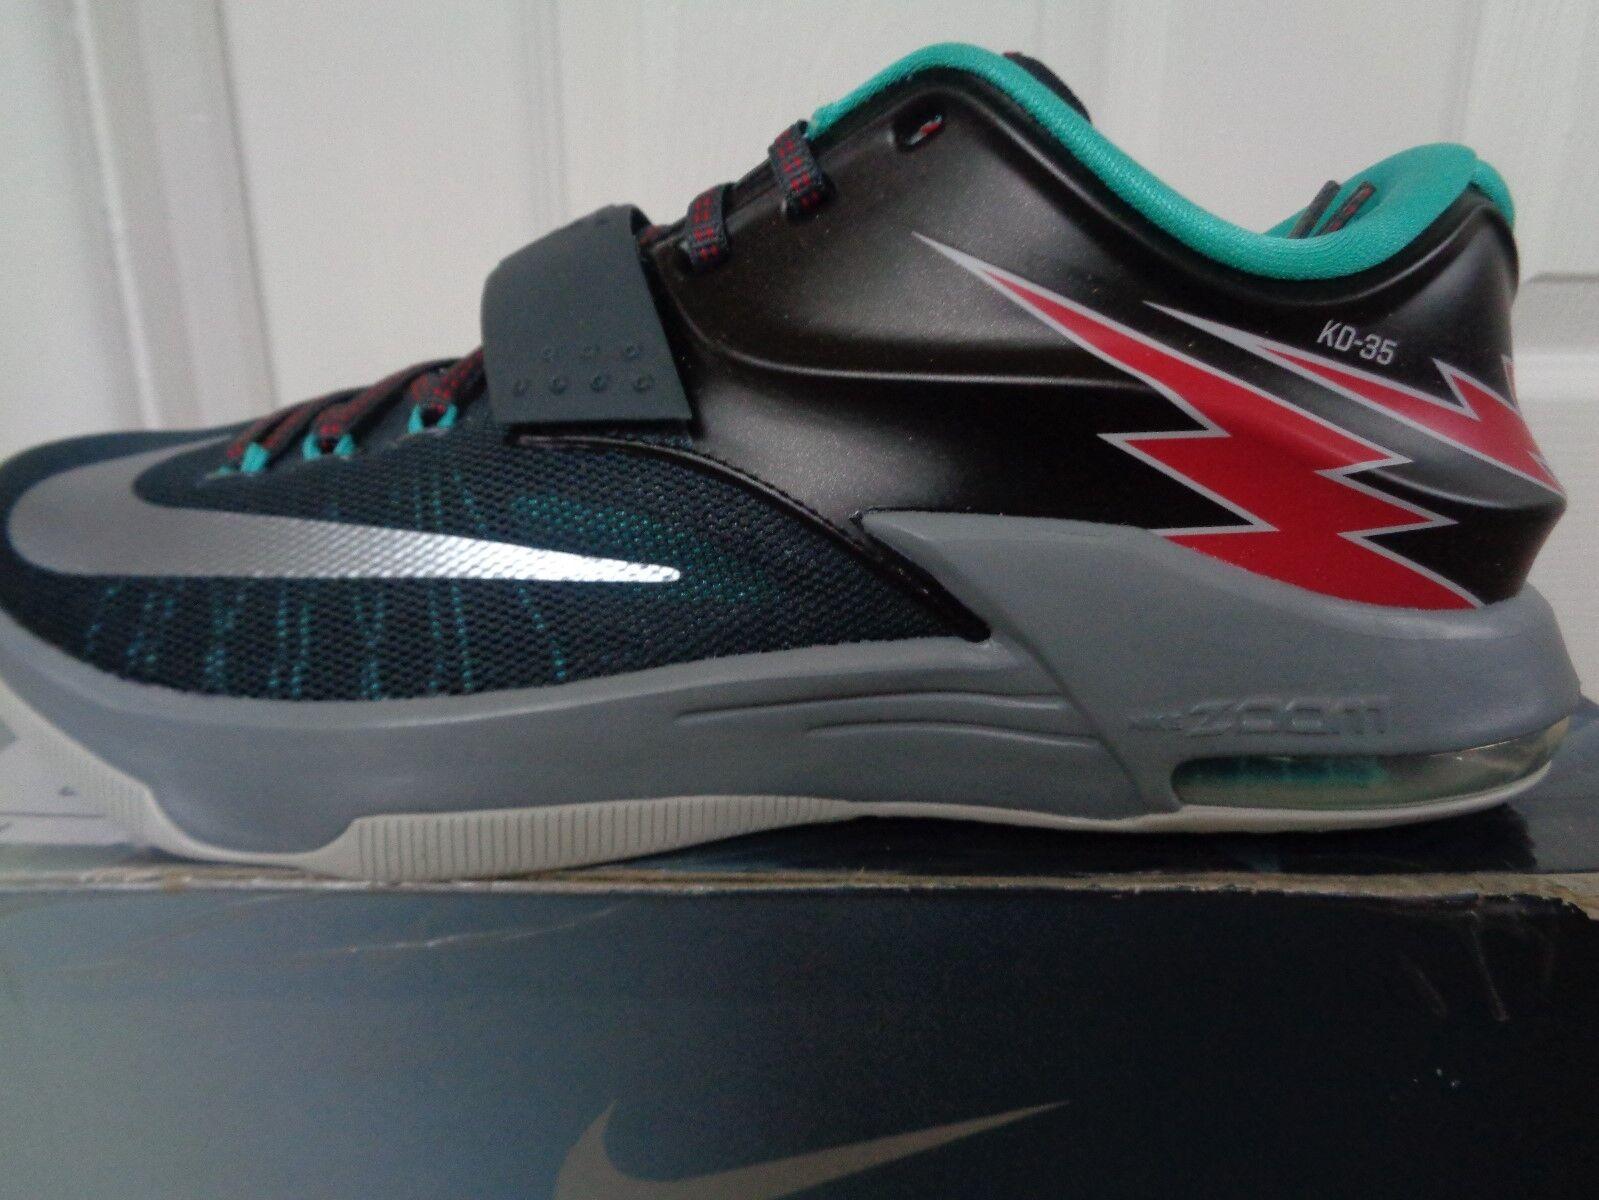 Nike Scarpe Da Ginnastica Basket Basket Scarpe Basket KD VII Scarpe Basket Da   34fef6